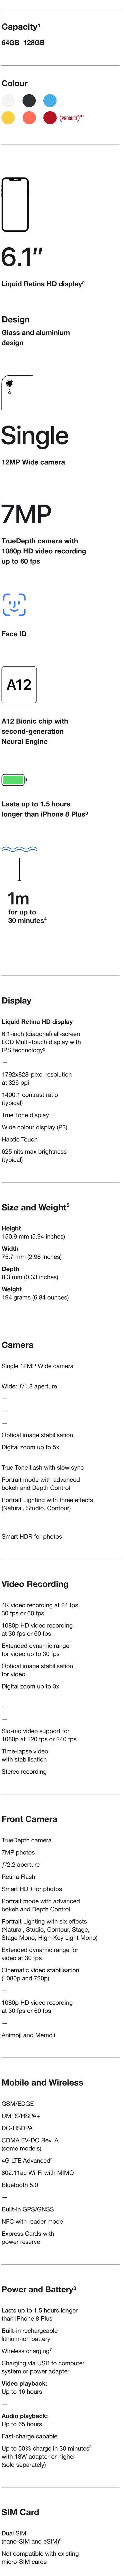 apple iphone comparison chart